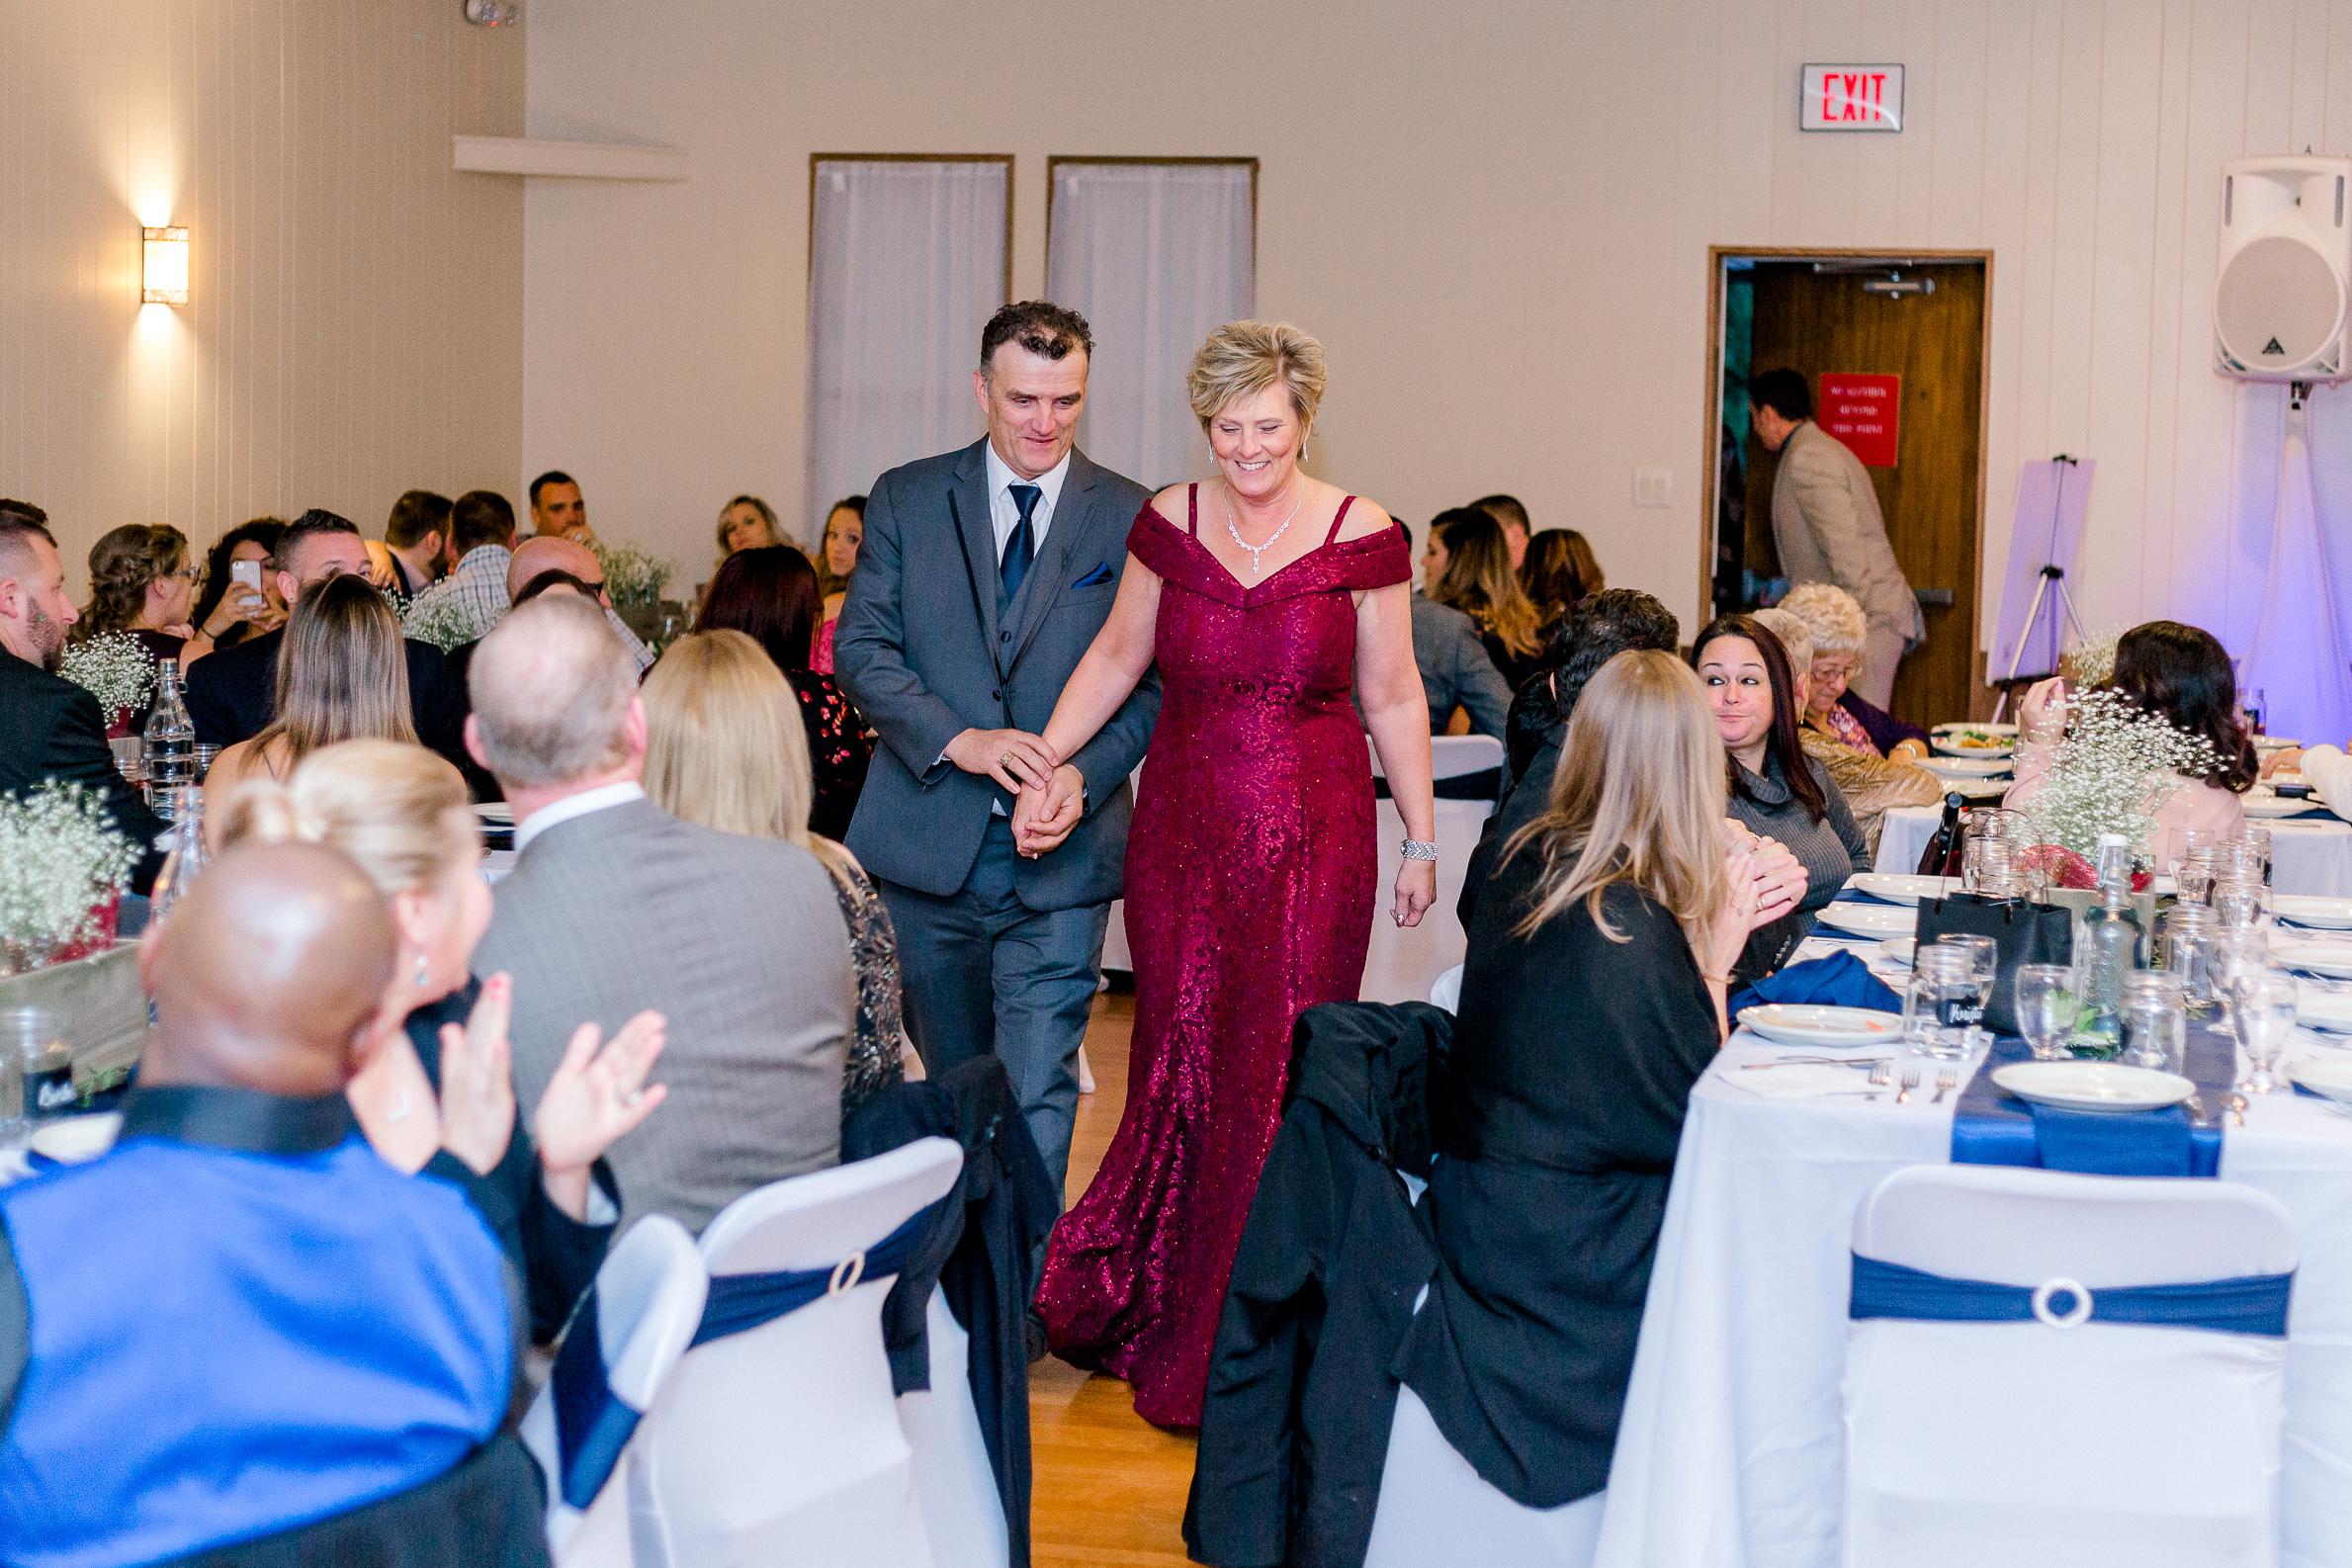 Pennsylvania October Fall Lehigh Valley wedding and lifestyle photographer Lytle Photo Co (136 of 167).jpg